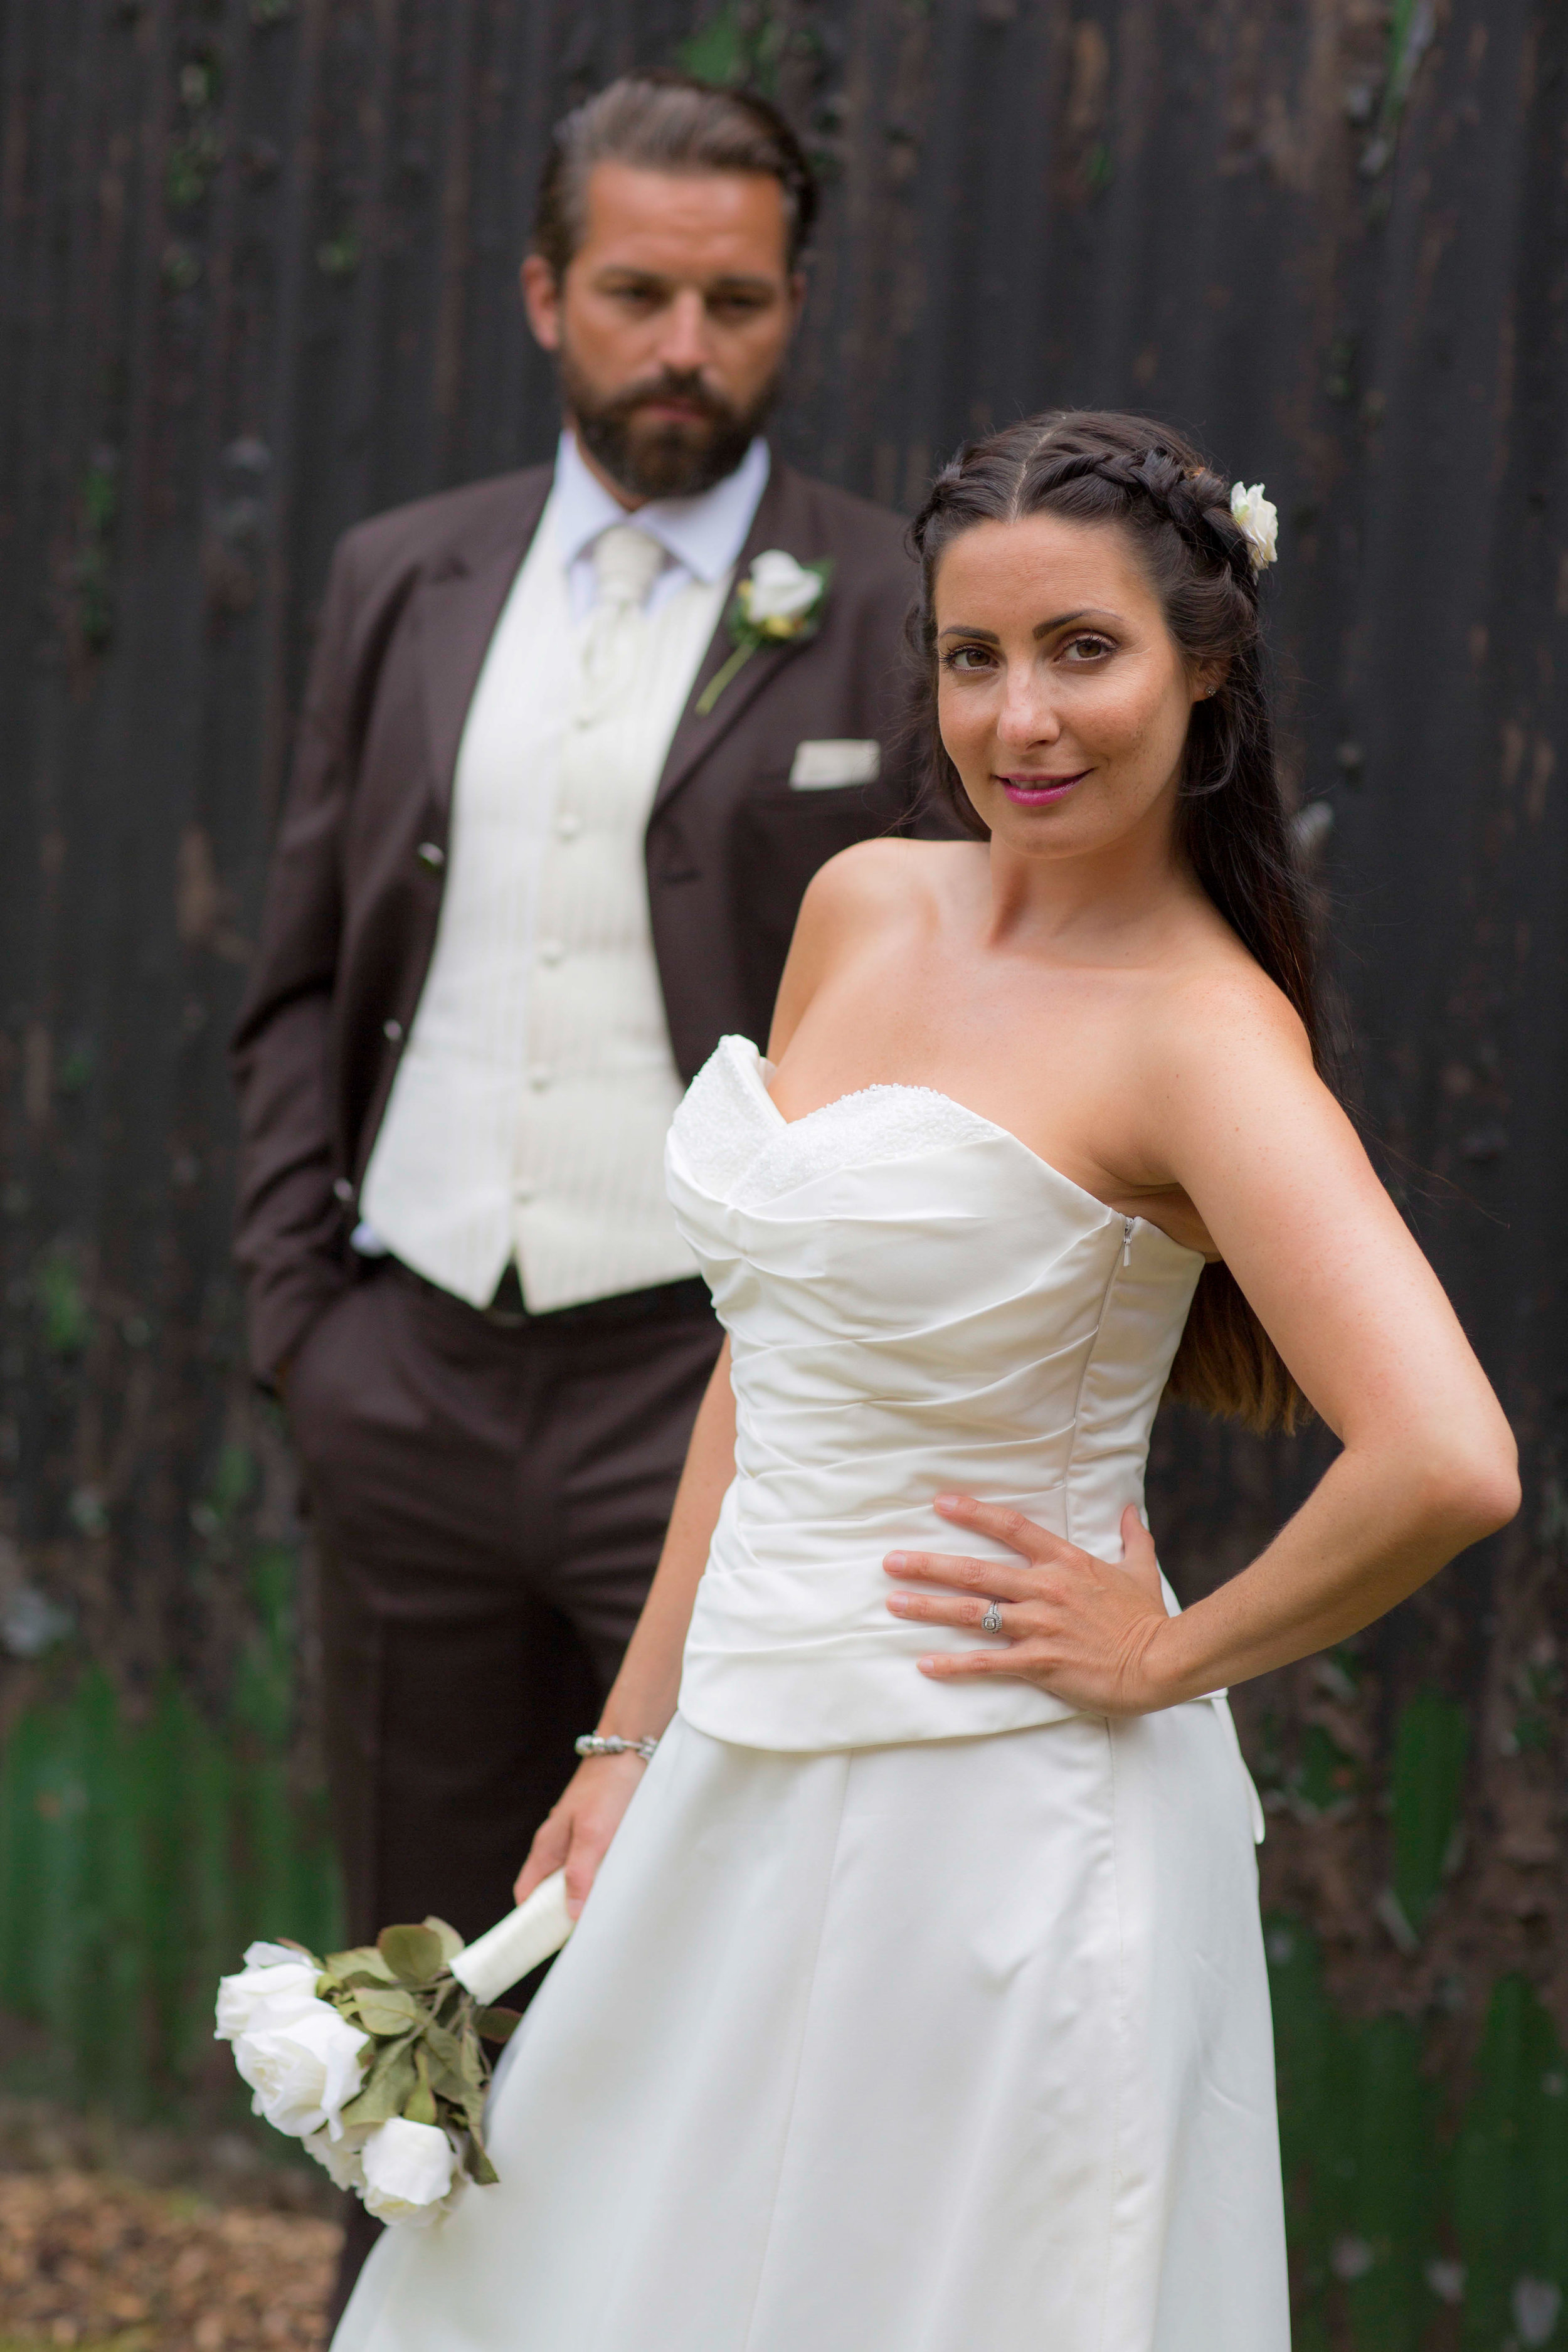 essex_wedding_photographer-15.jpg